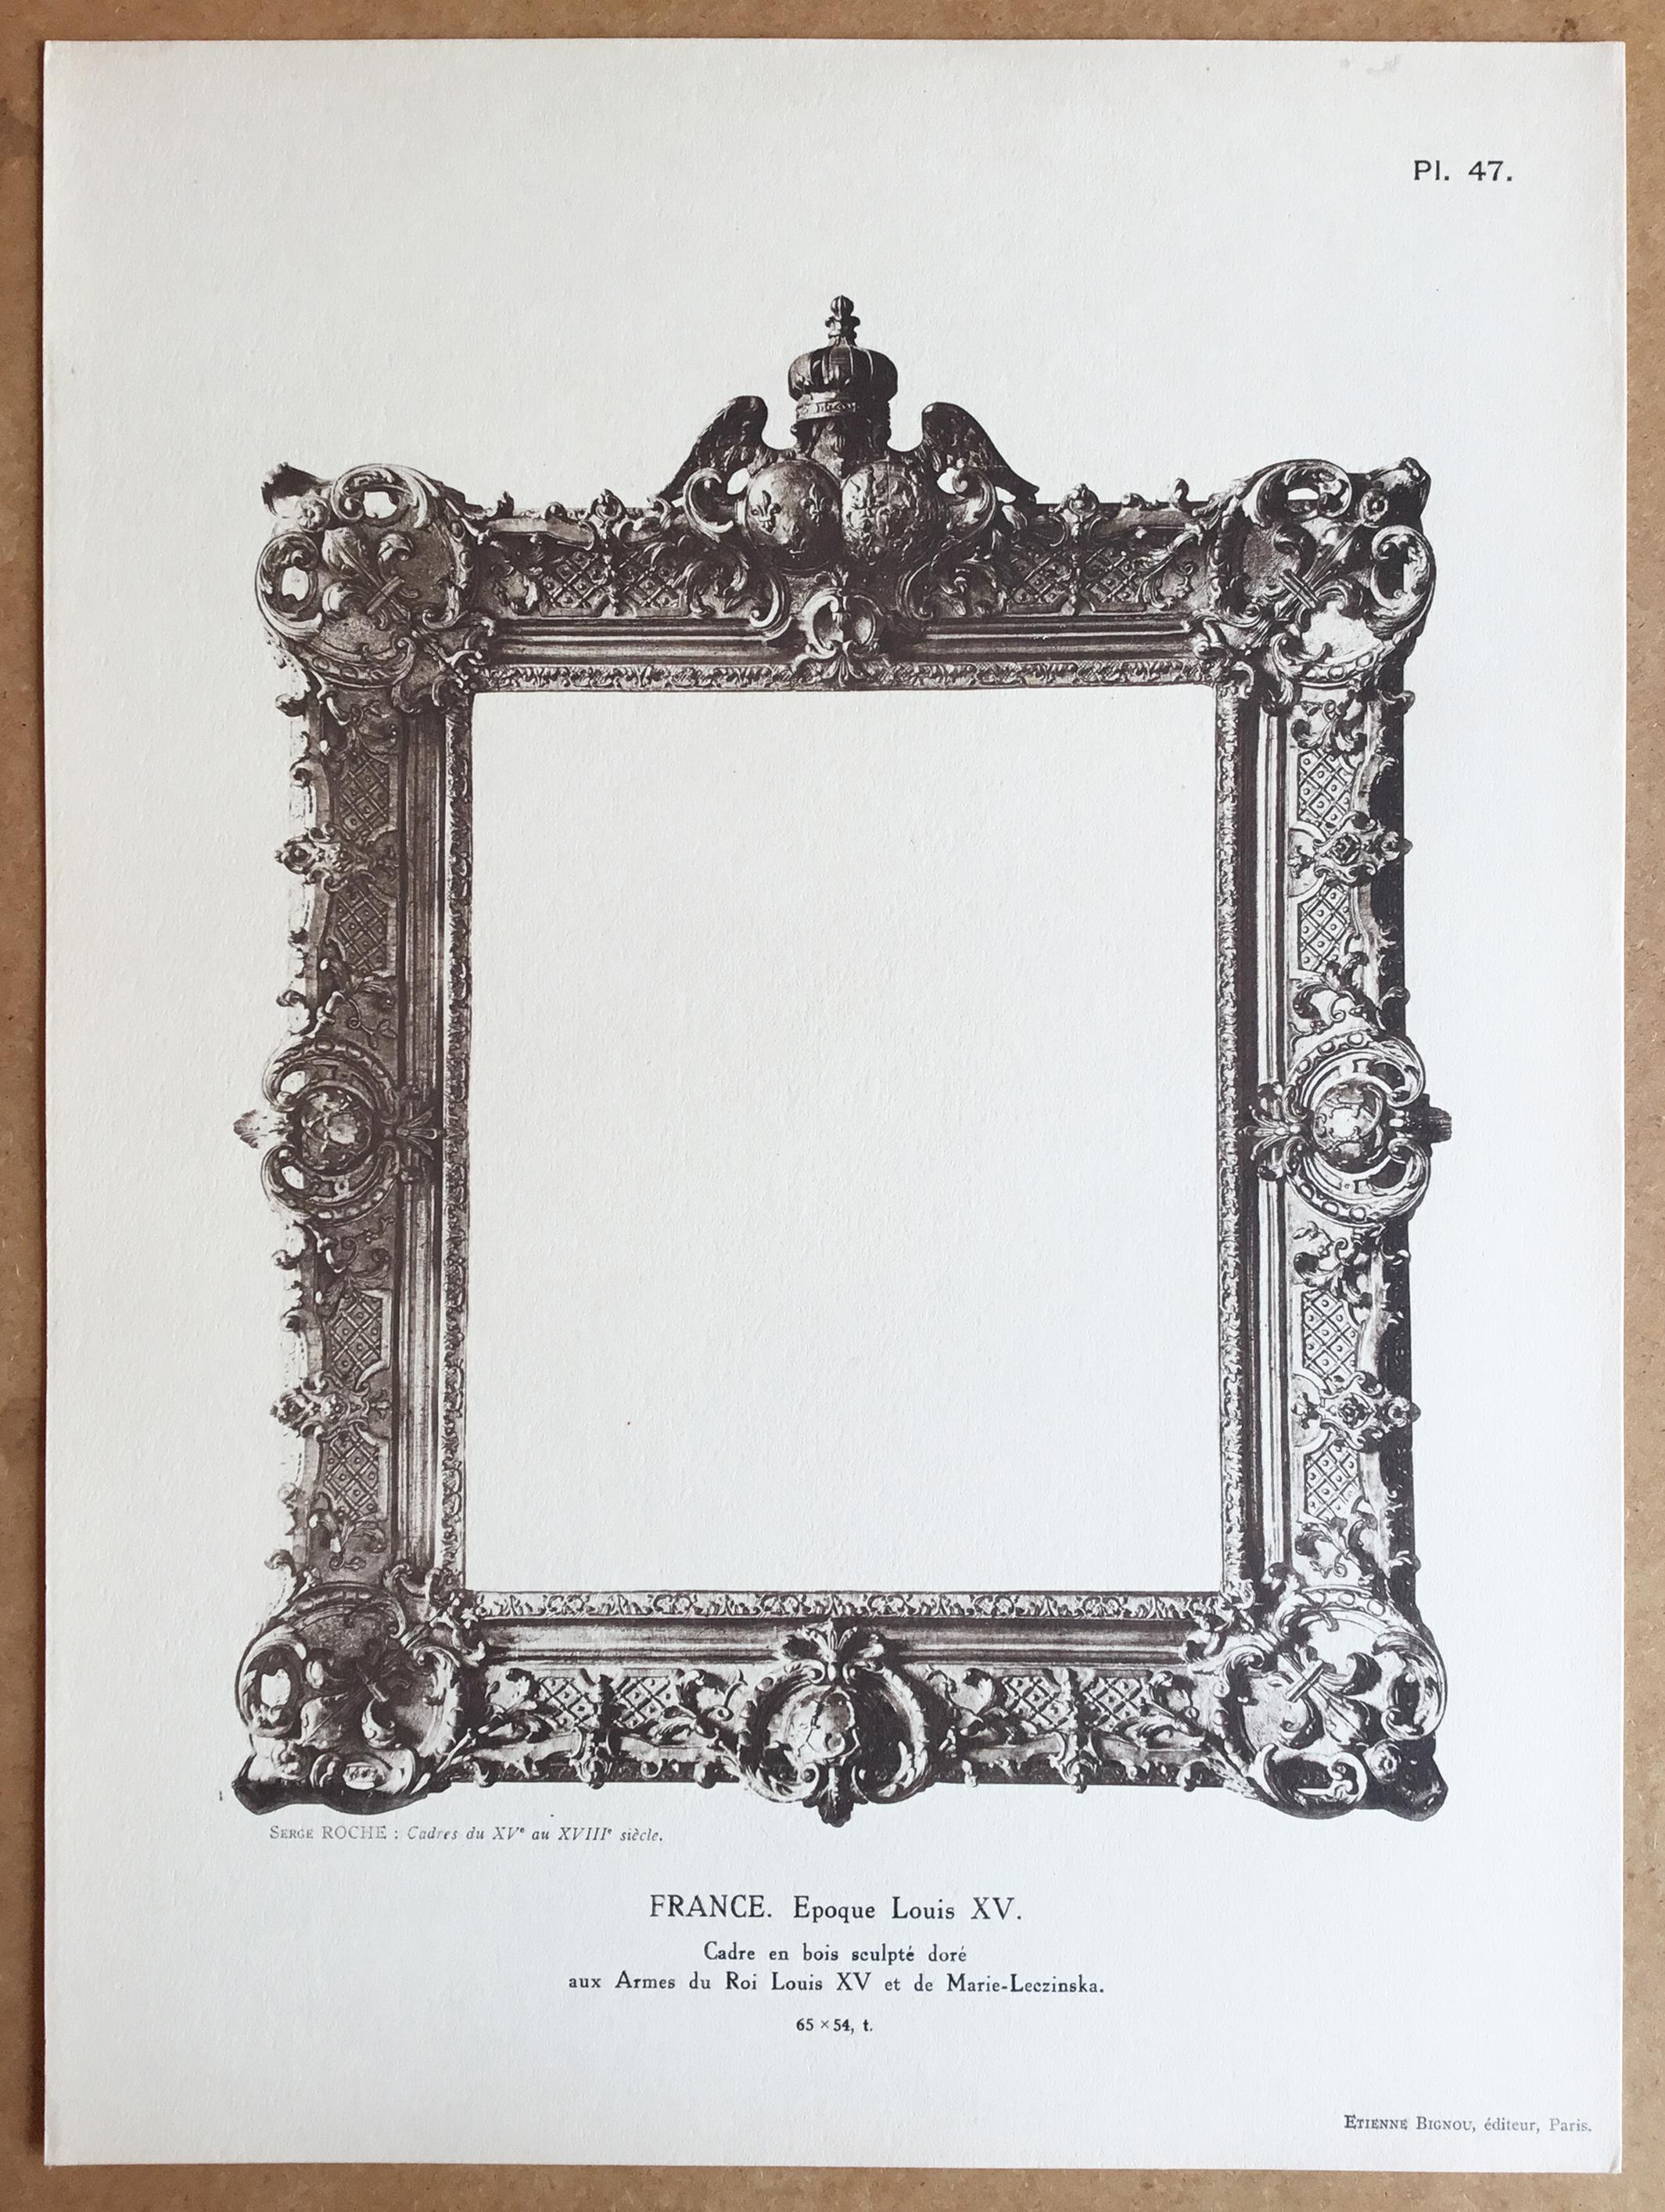 17 Plate 47